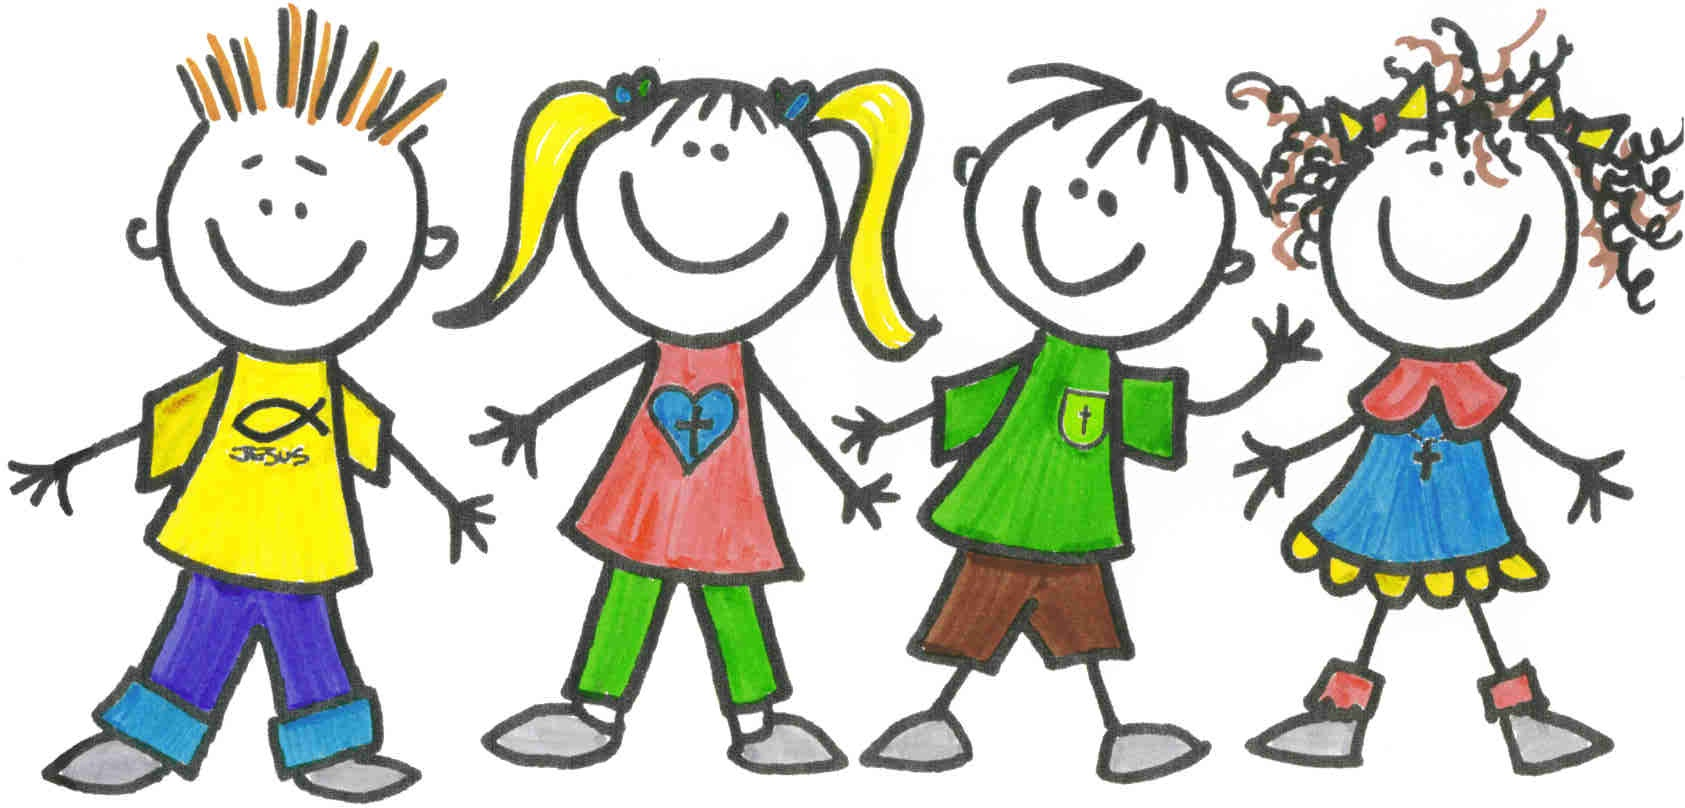 Free Printable Preschool Borders   Free Download Best Free Printable - Free Printable Preschool Clip Art